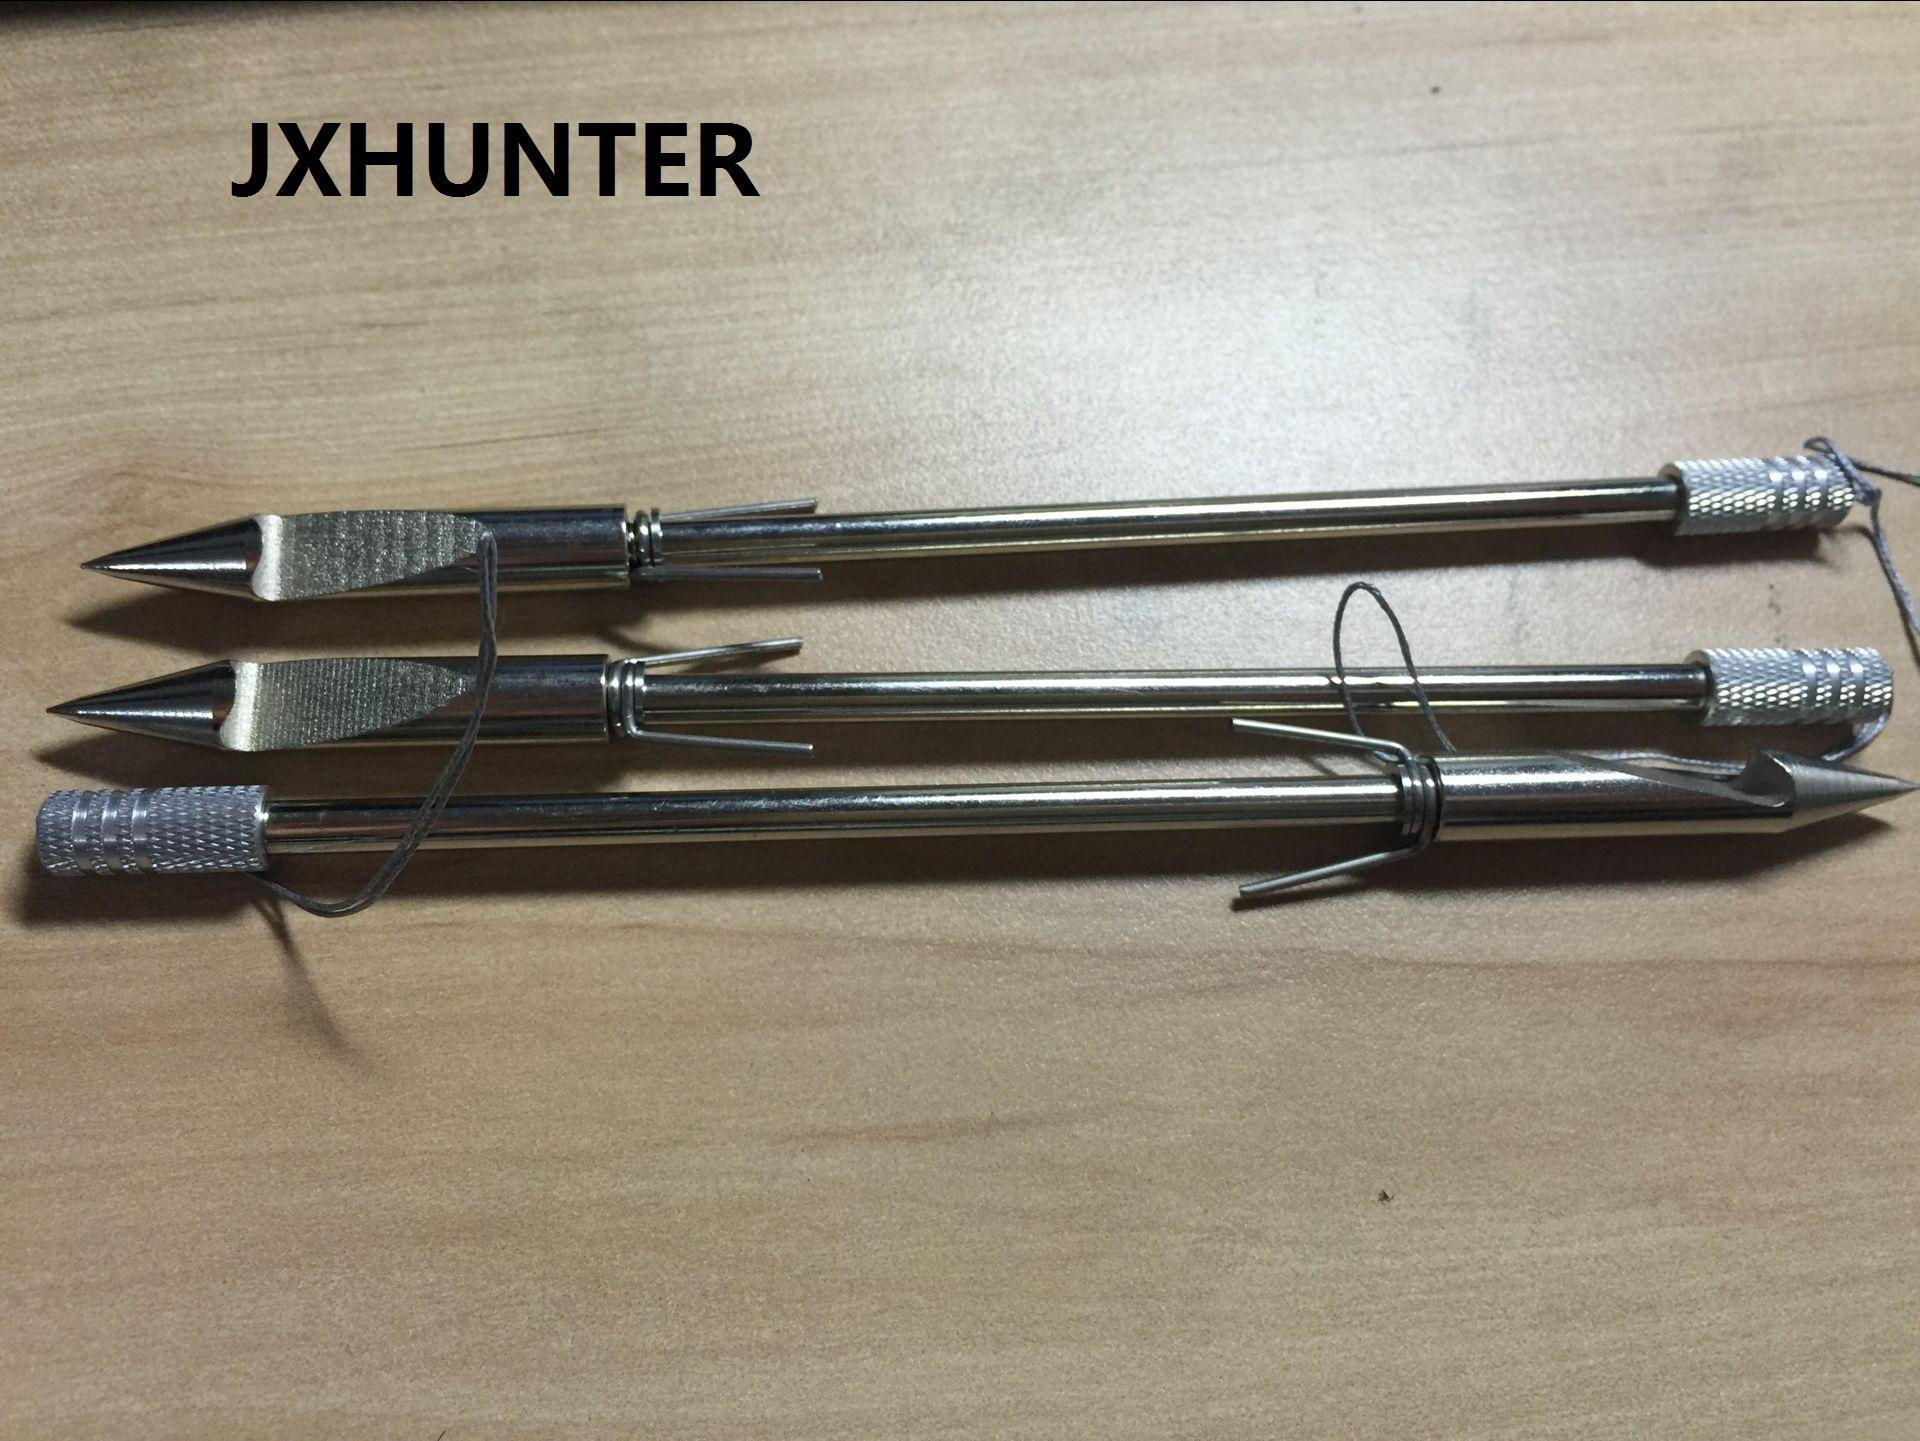 3 PK Steel Fishing Arrow Broadheads Arrowheads for Slingshot Fishing Hunting Tips 6.3 inches 35g